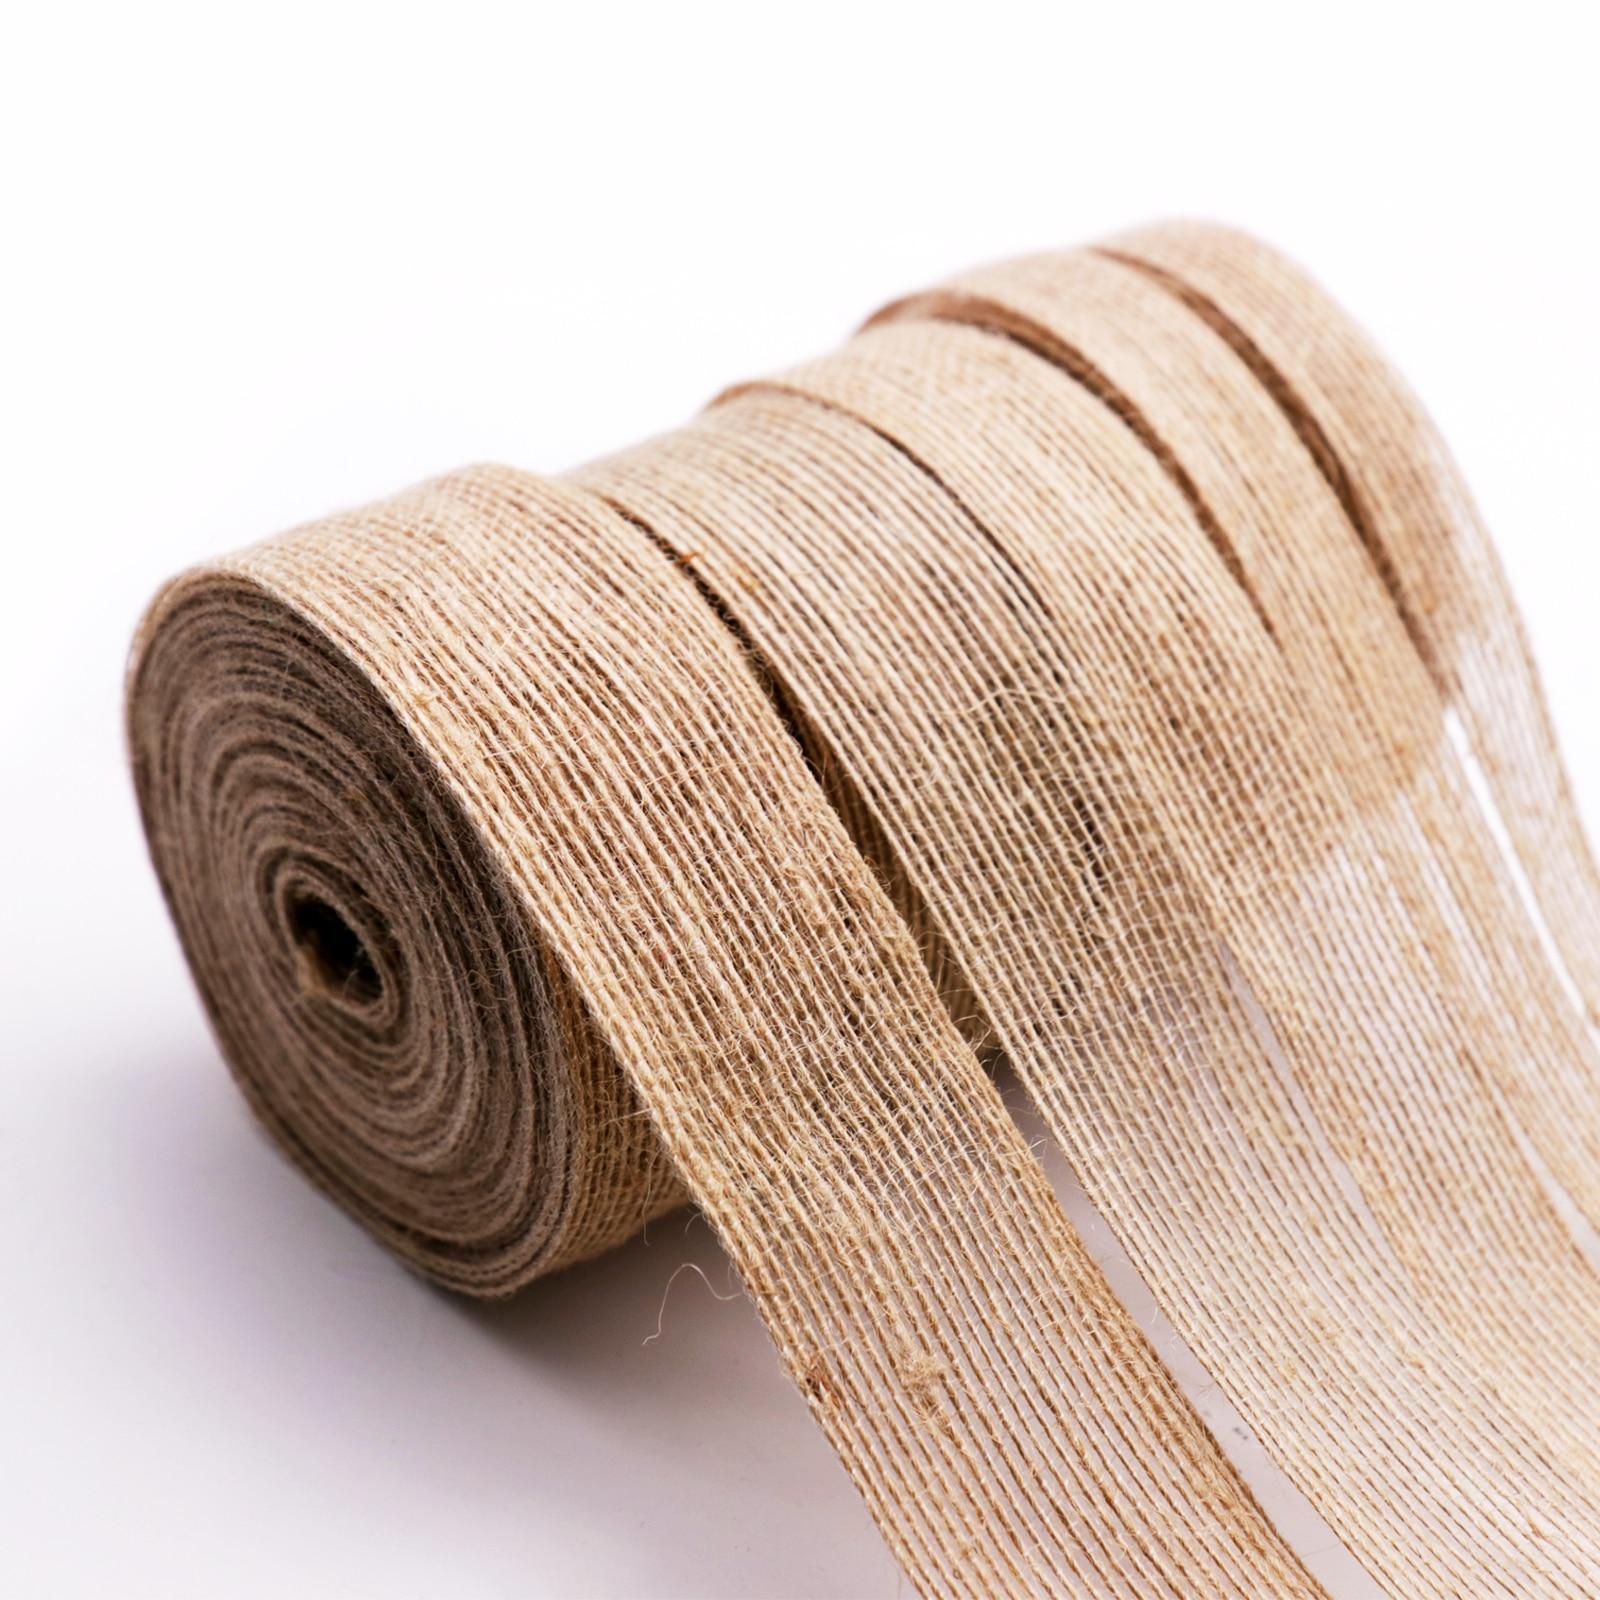 5Yard Natural Vintage Jute Burlap Ribbon 6/10/15/20/25/30/38mm DIY Bag Material Wedding Party Crafts Decorative Gift Warrping